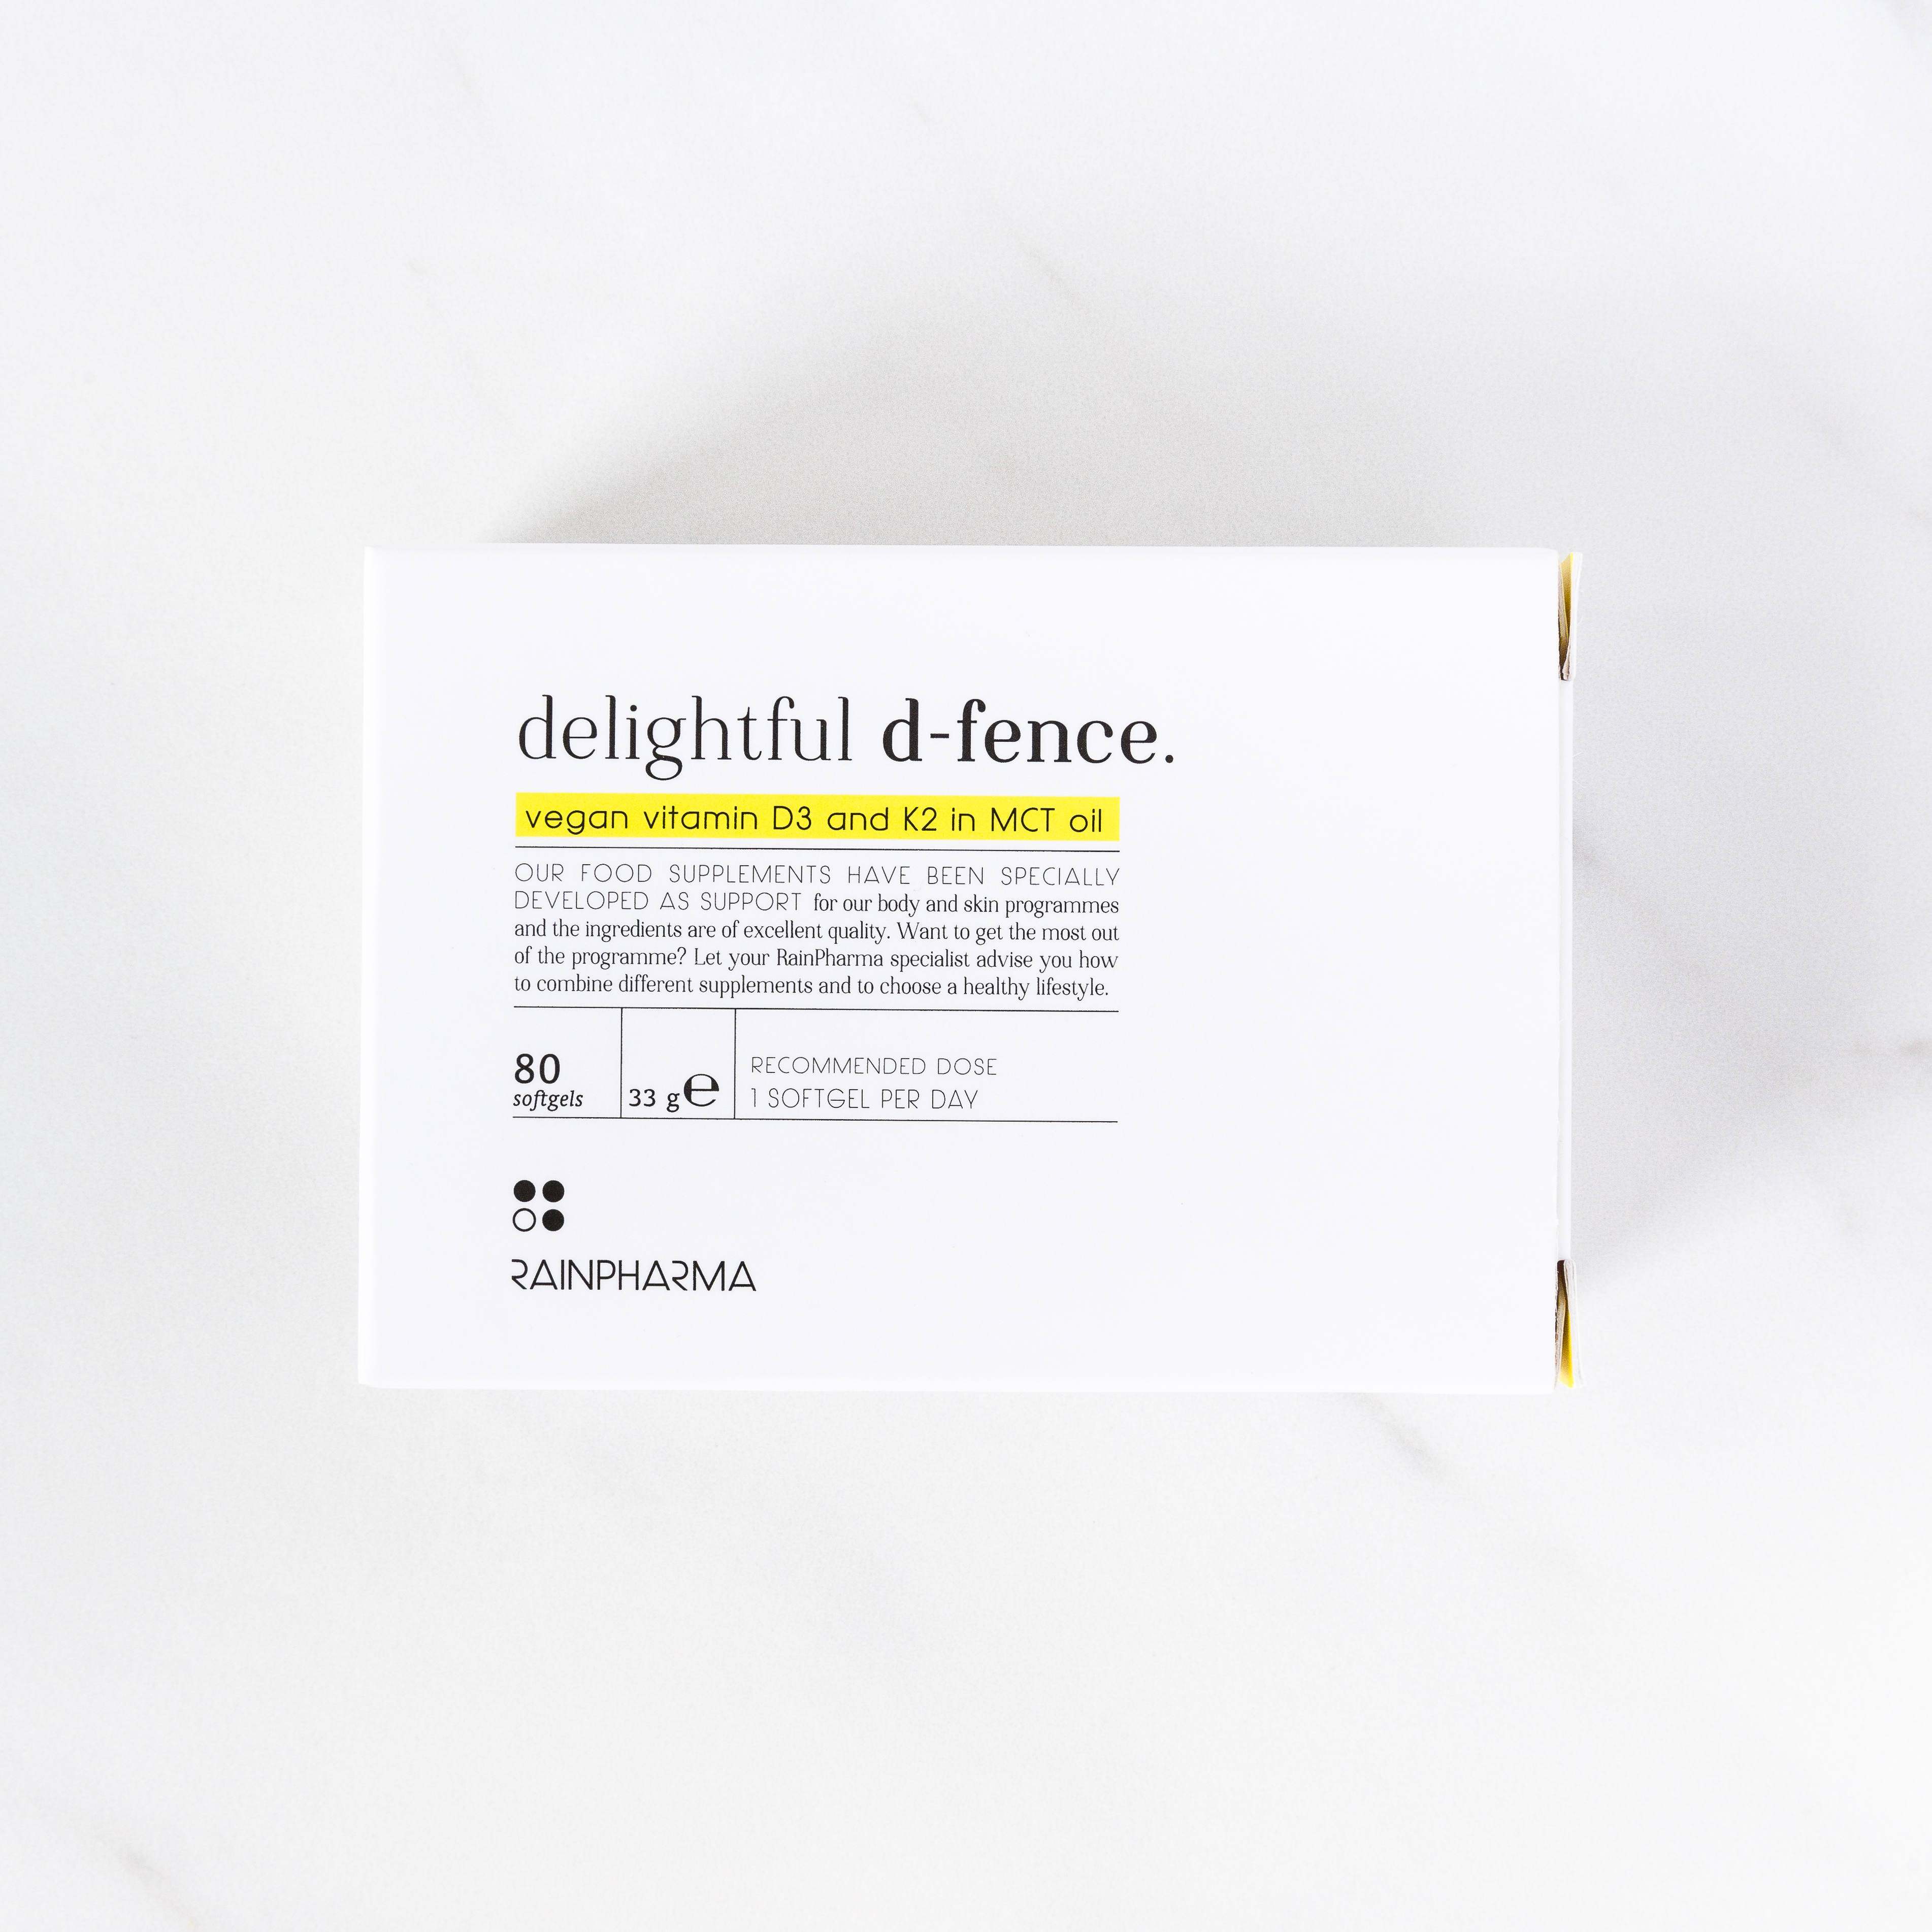 delightful-d-fence